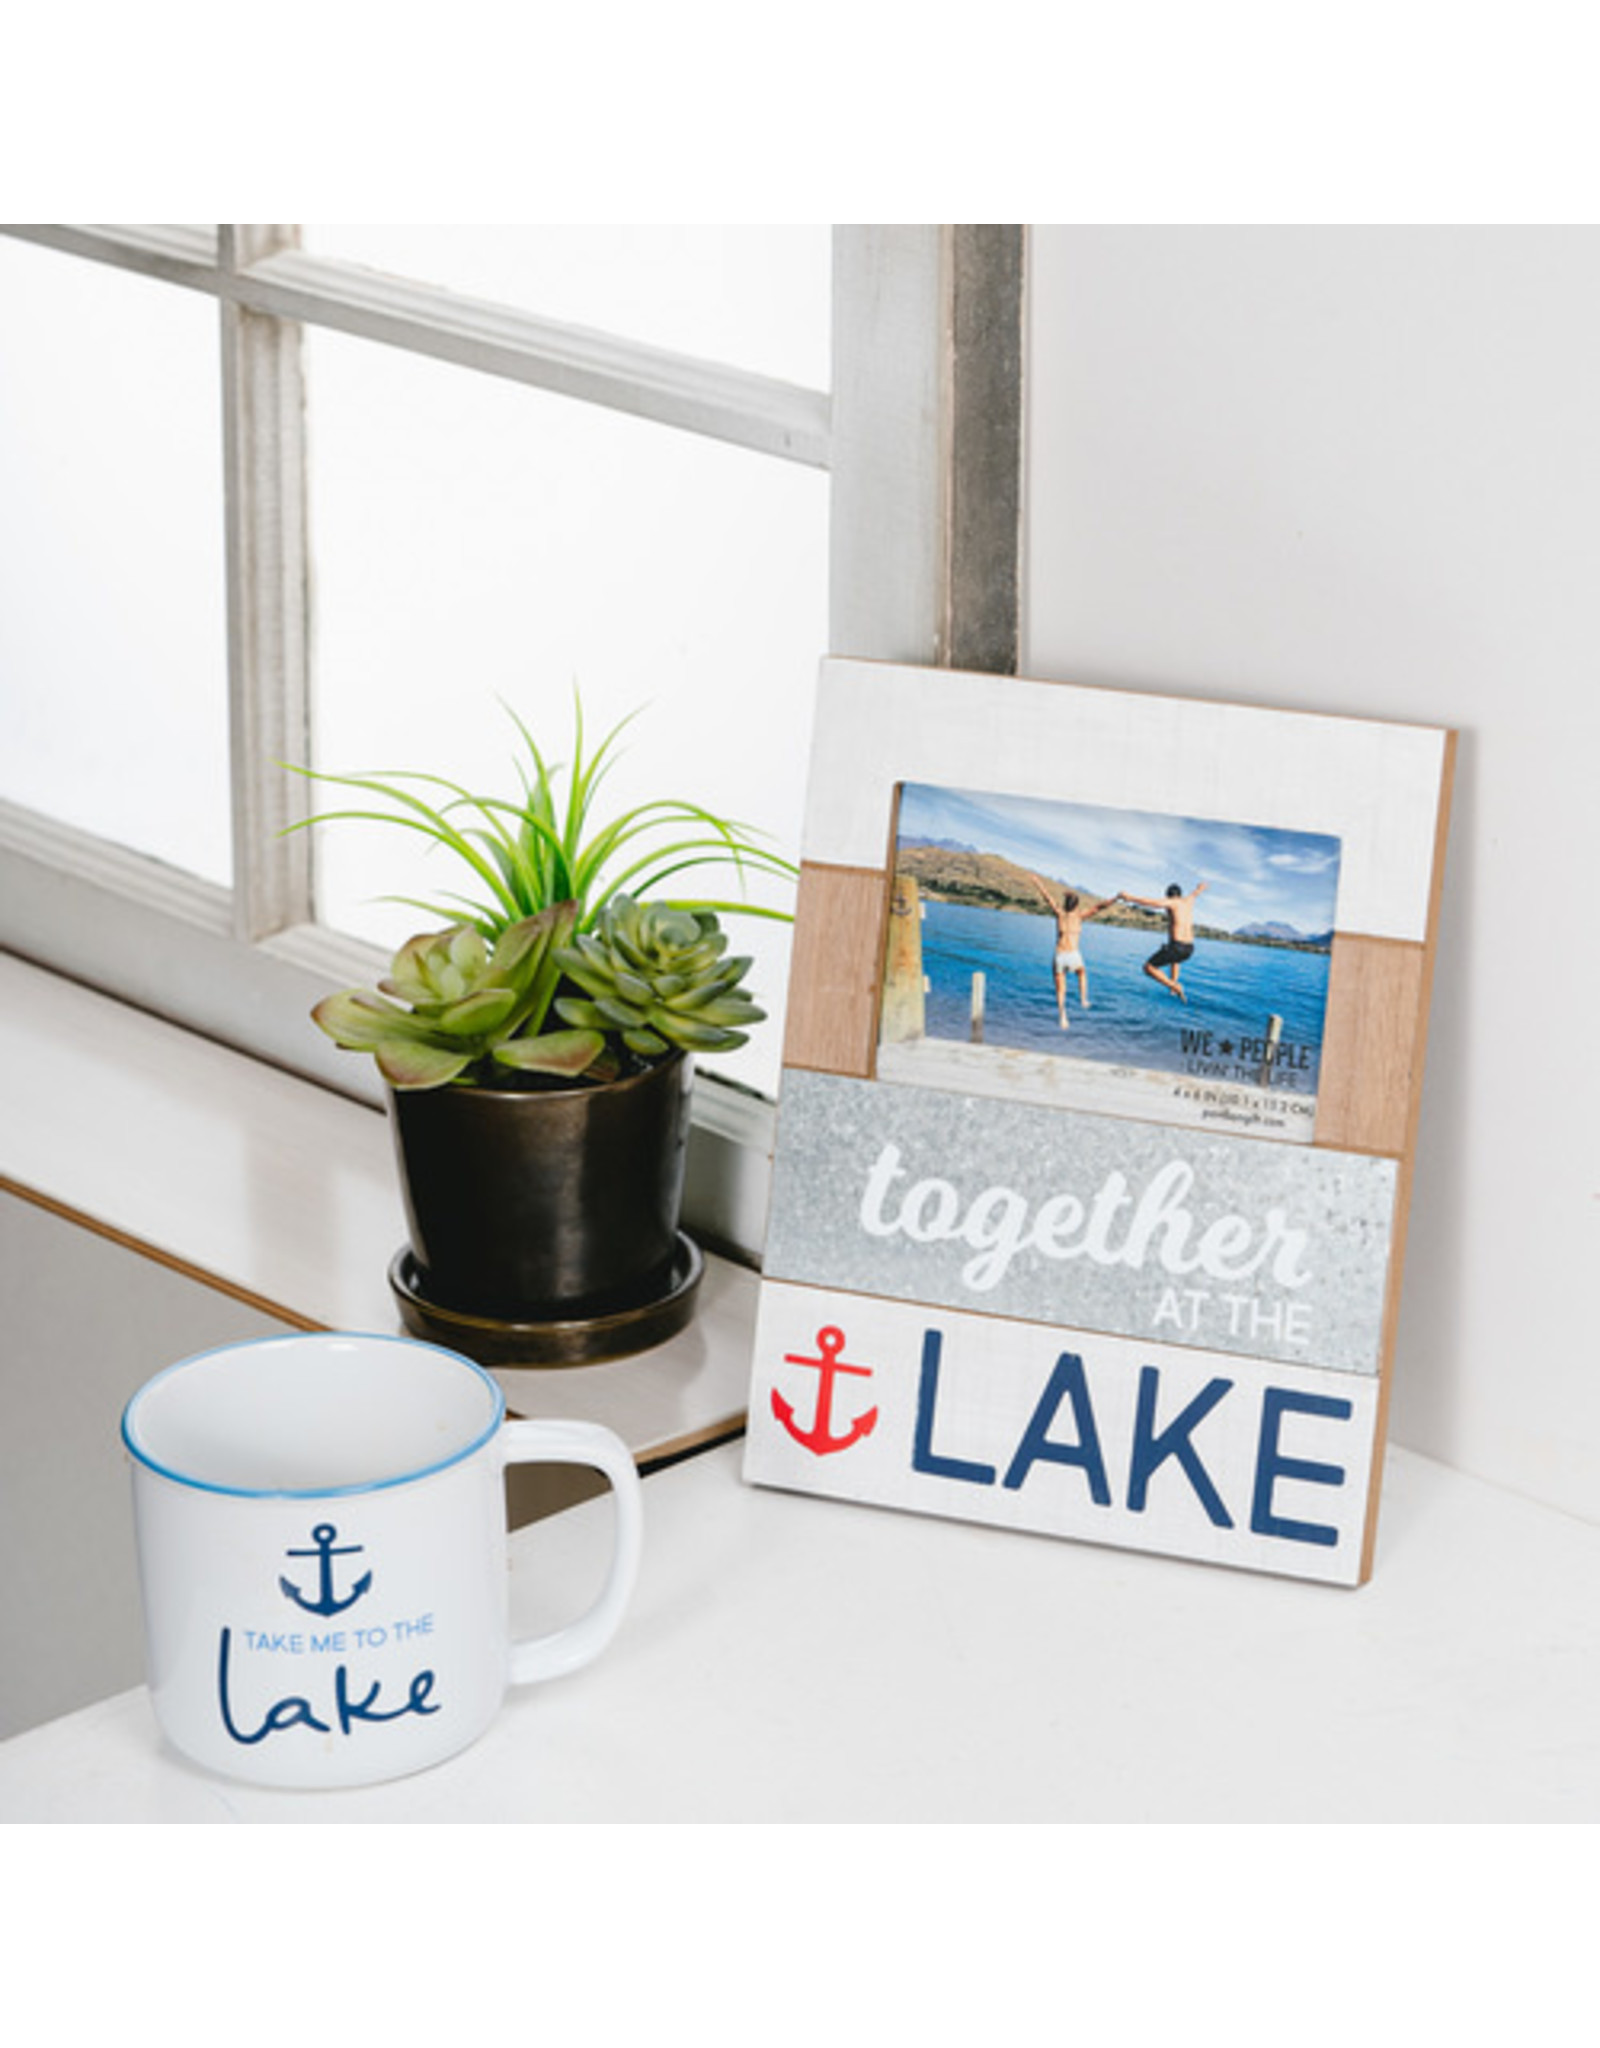 Pavilion Gift LAKE FRAME